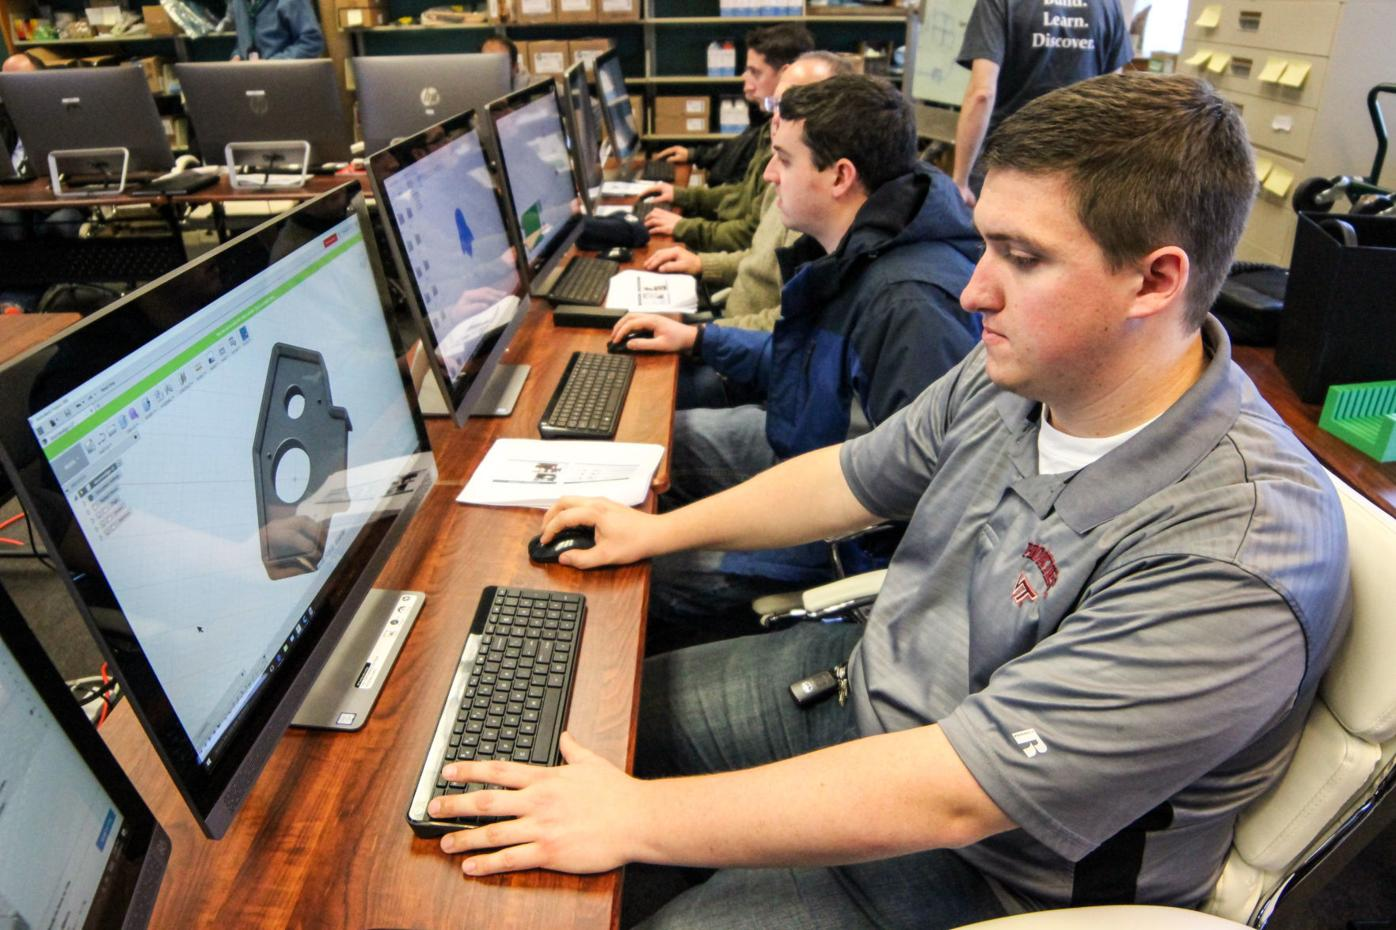 NAVAIR promotes 3-D printing skills for workforce